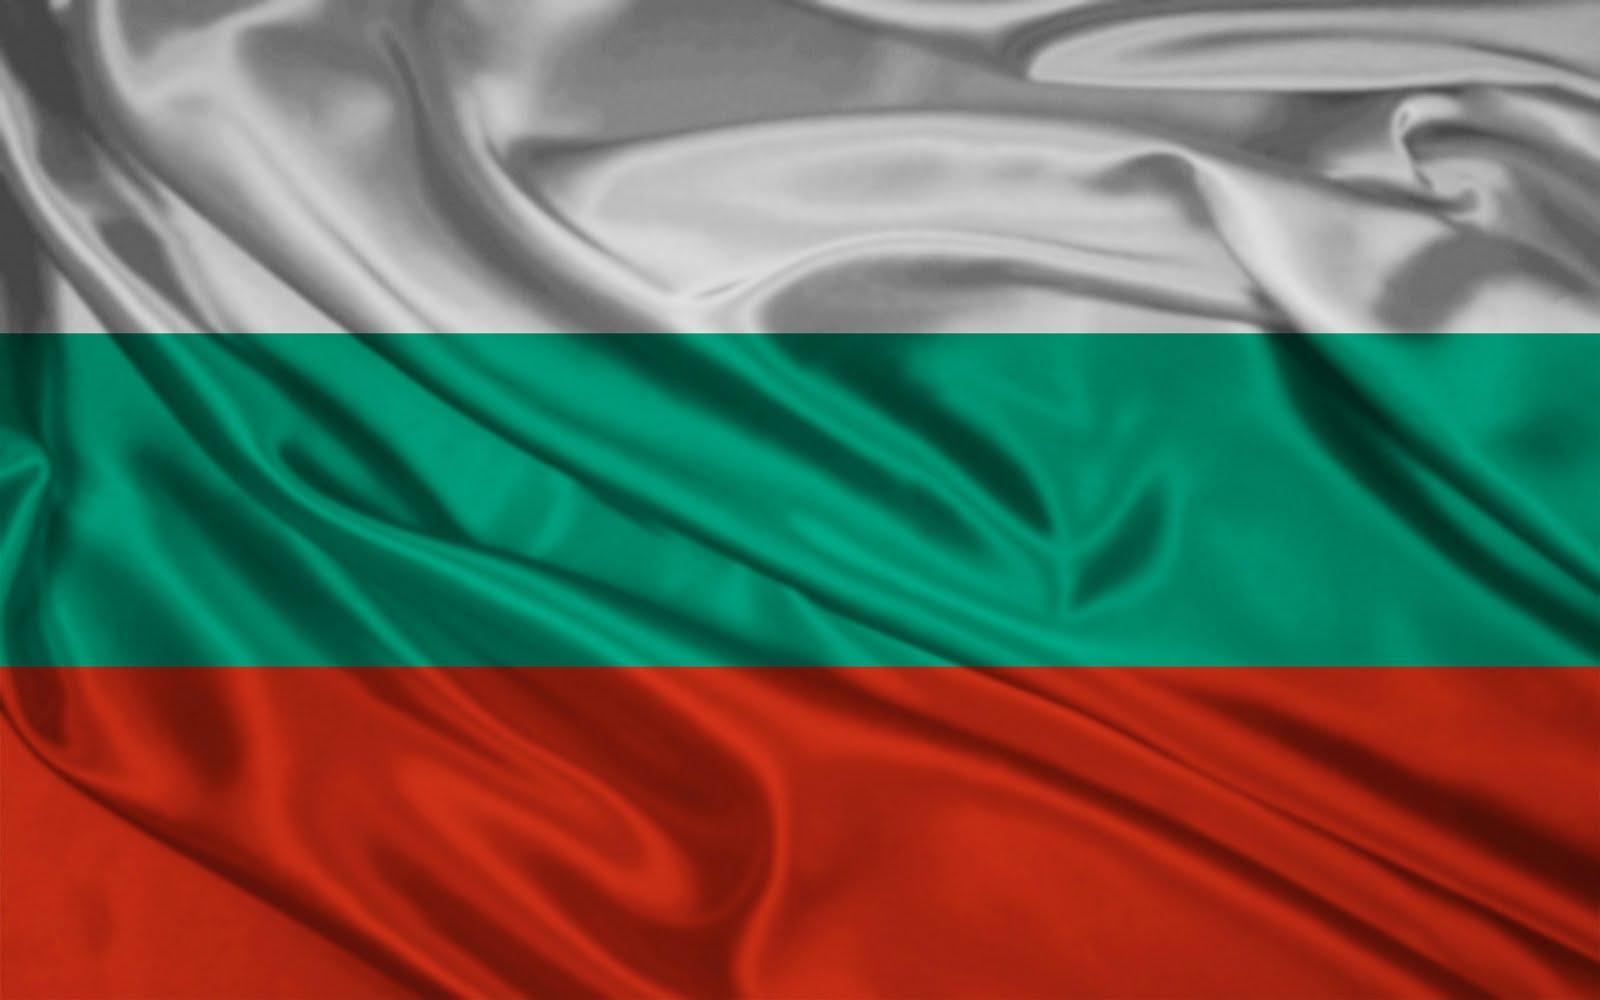 http://3.bp.blogspot.com/-fhaX3x2SXyg/TcnTcLdHRzI/AAAAAAAAAzI/xQf8unp2xT0/s1600/Wallpapers+Flag+of+Bulgaria+%25284%2529.jpg